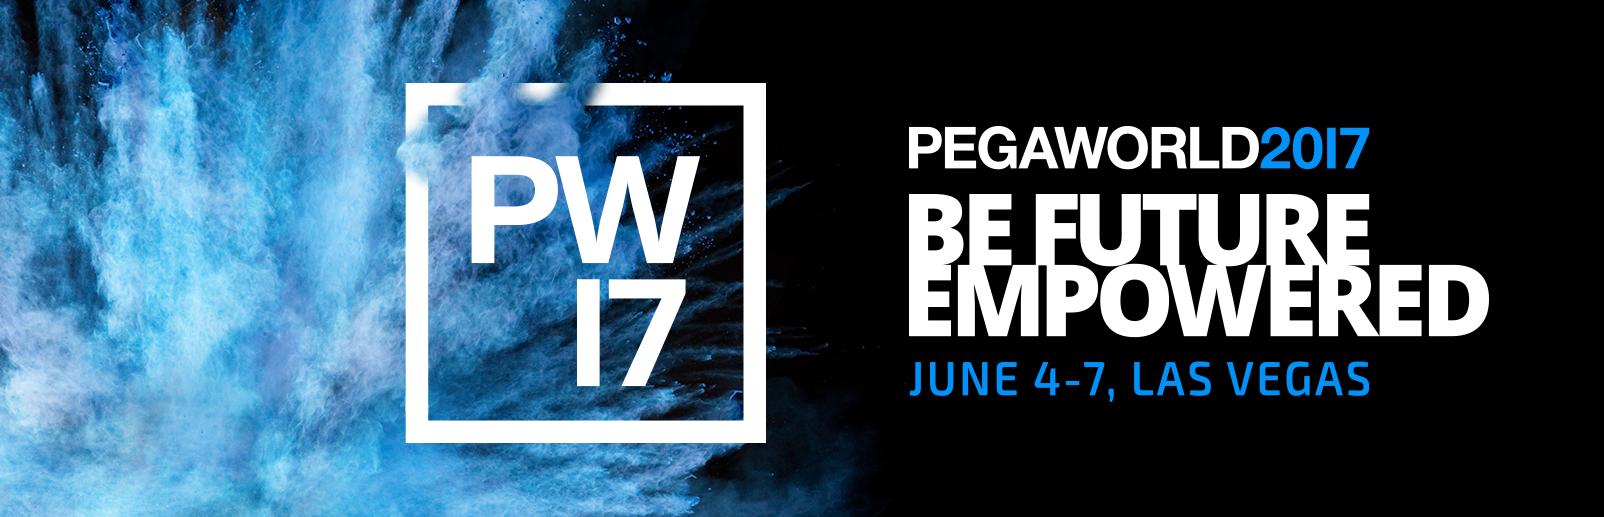 PegaWorld 2017